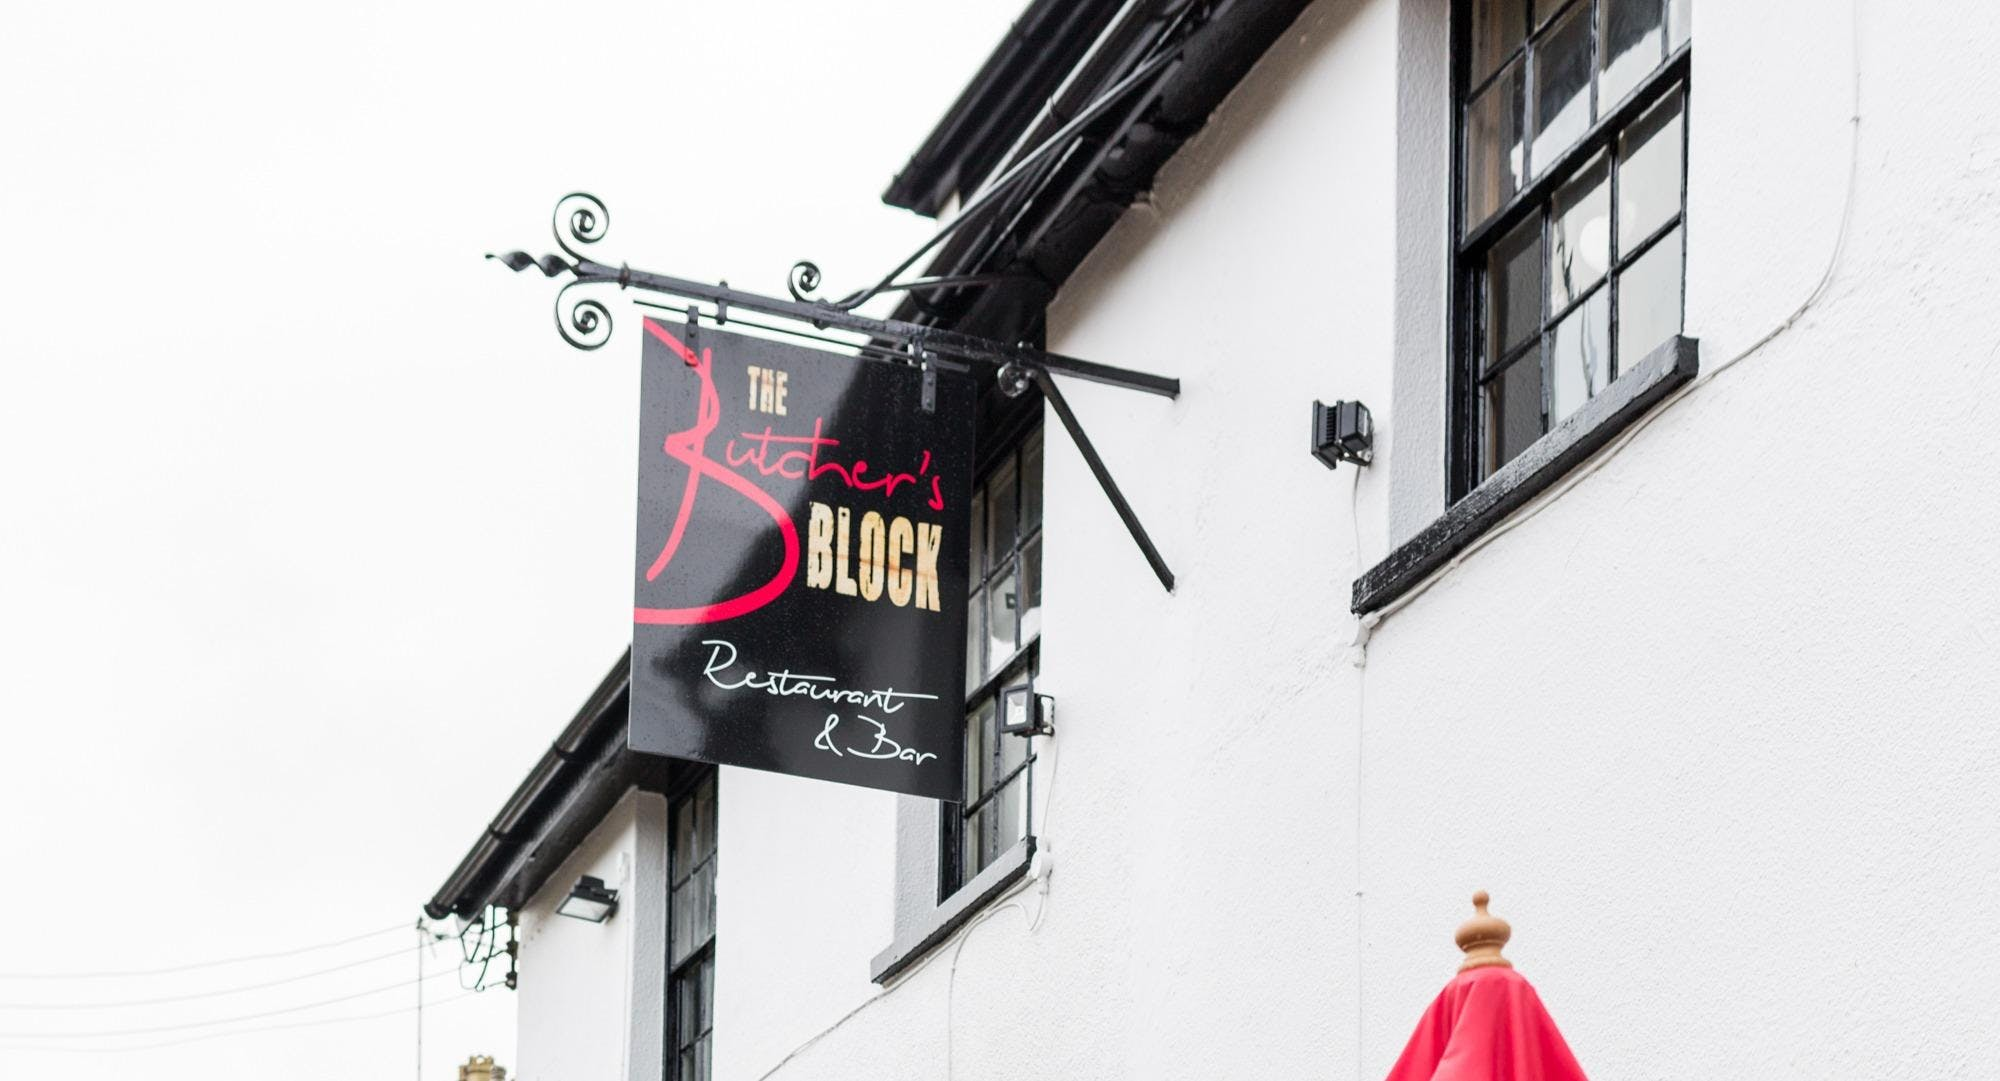 The Butcher's Block Restaurant & Bar Rochester image 3